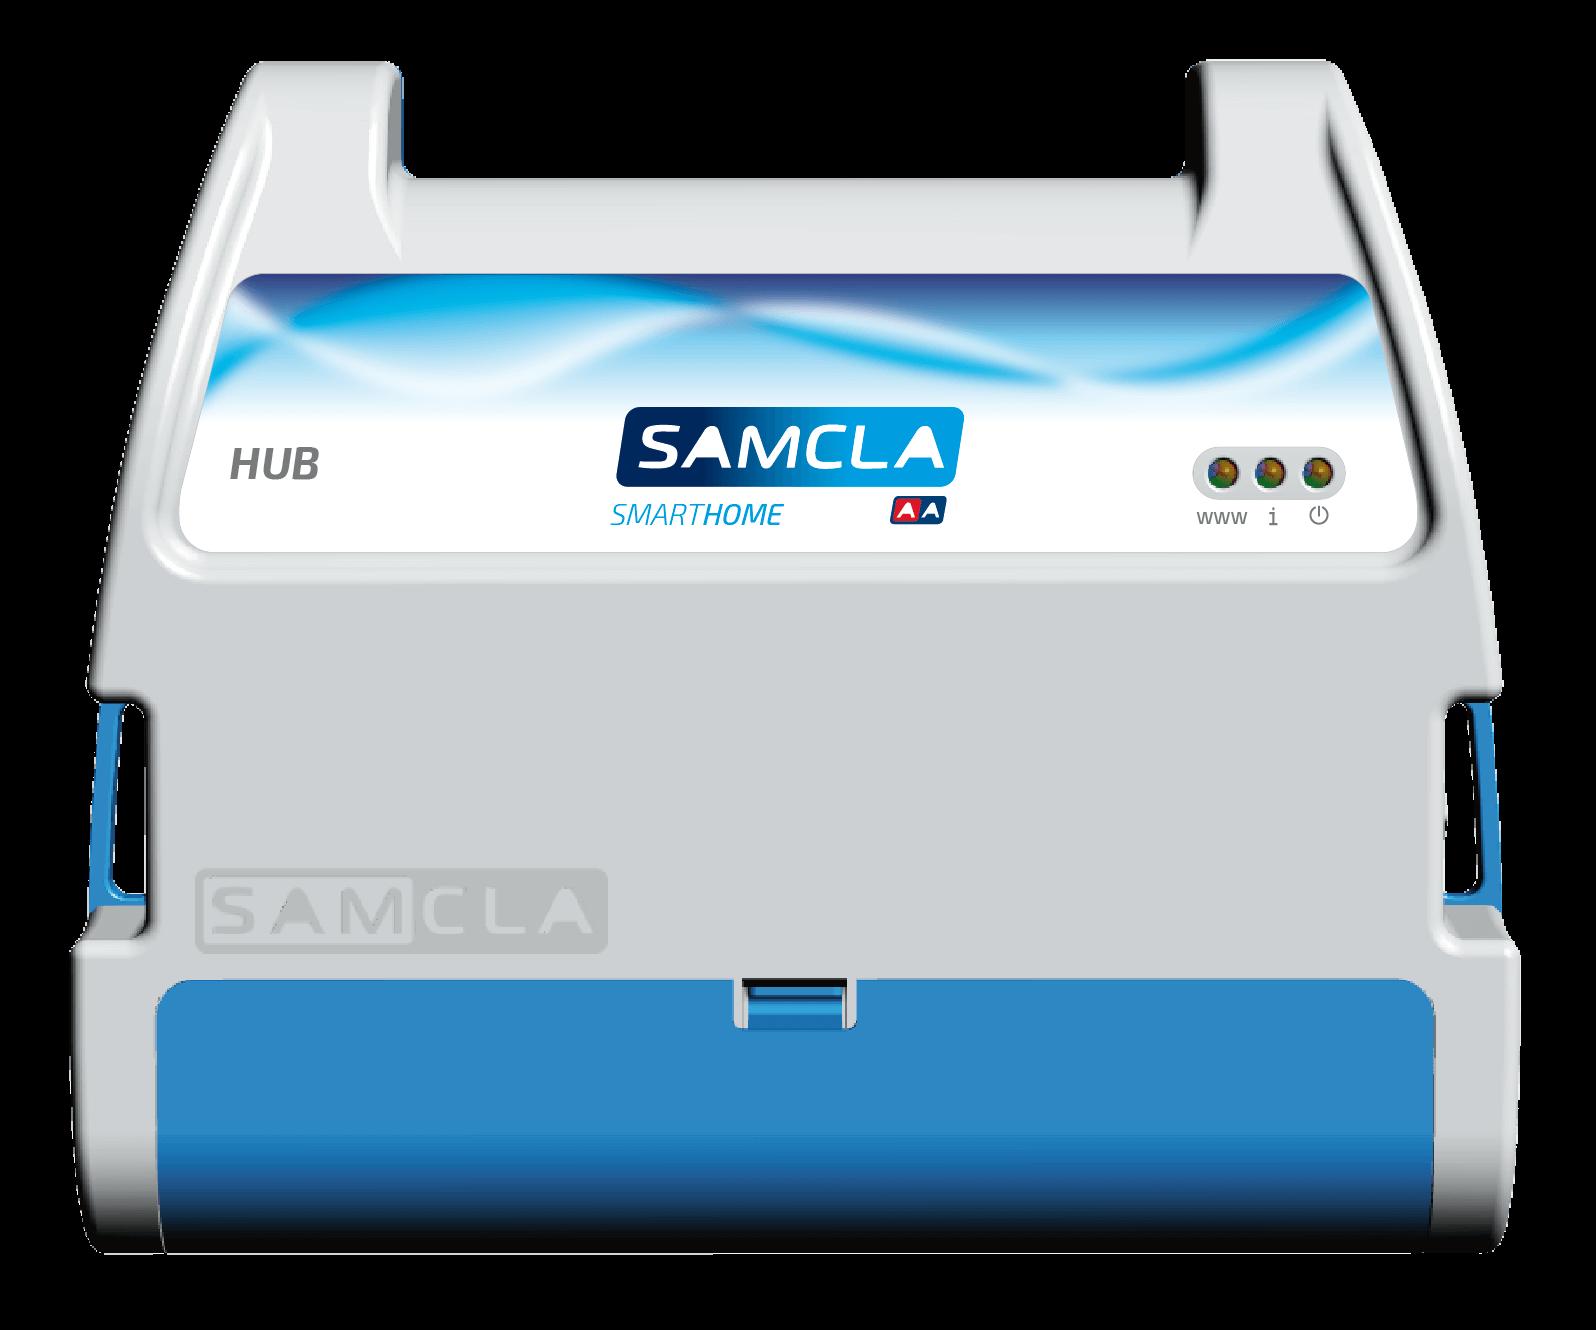 HUB Sistema Samcla Home